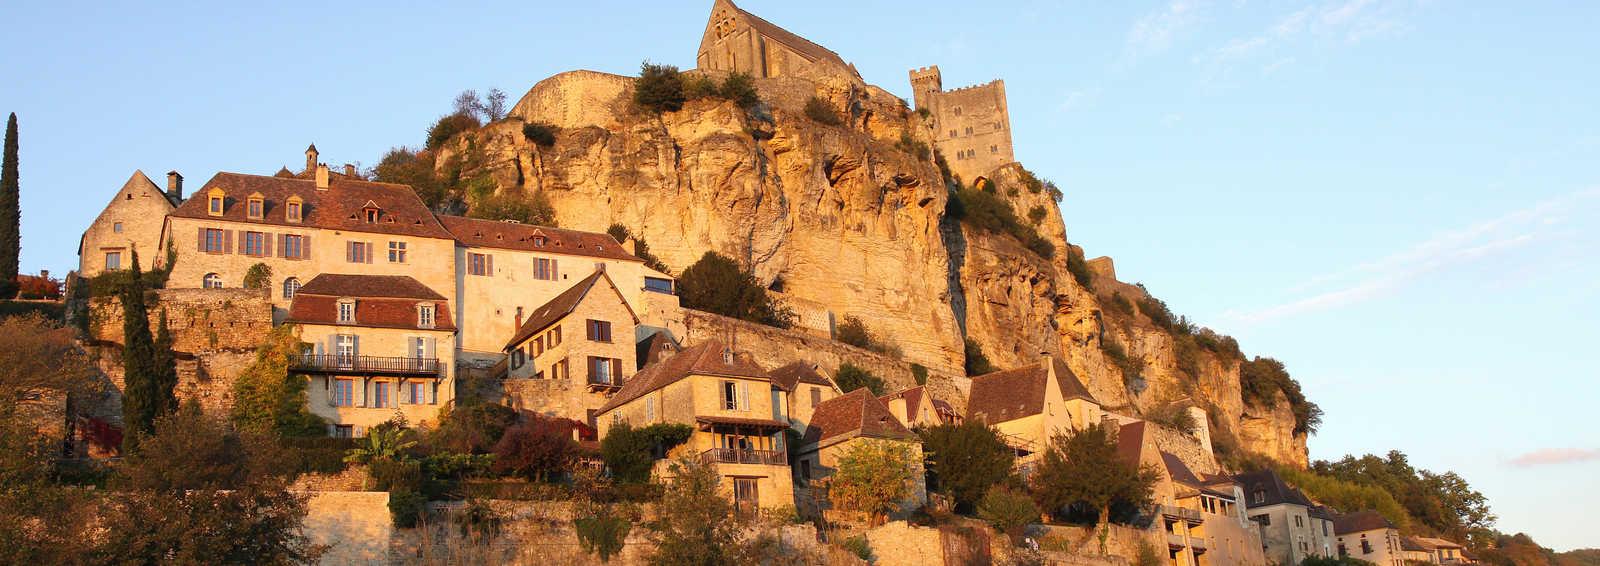 Beynac village, Dordogne, France